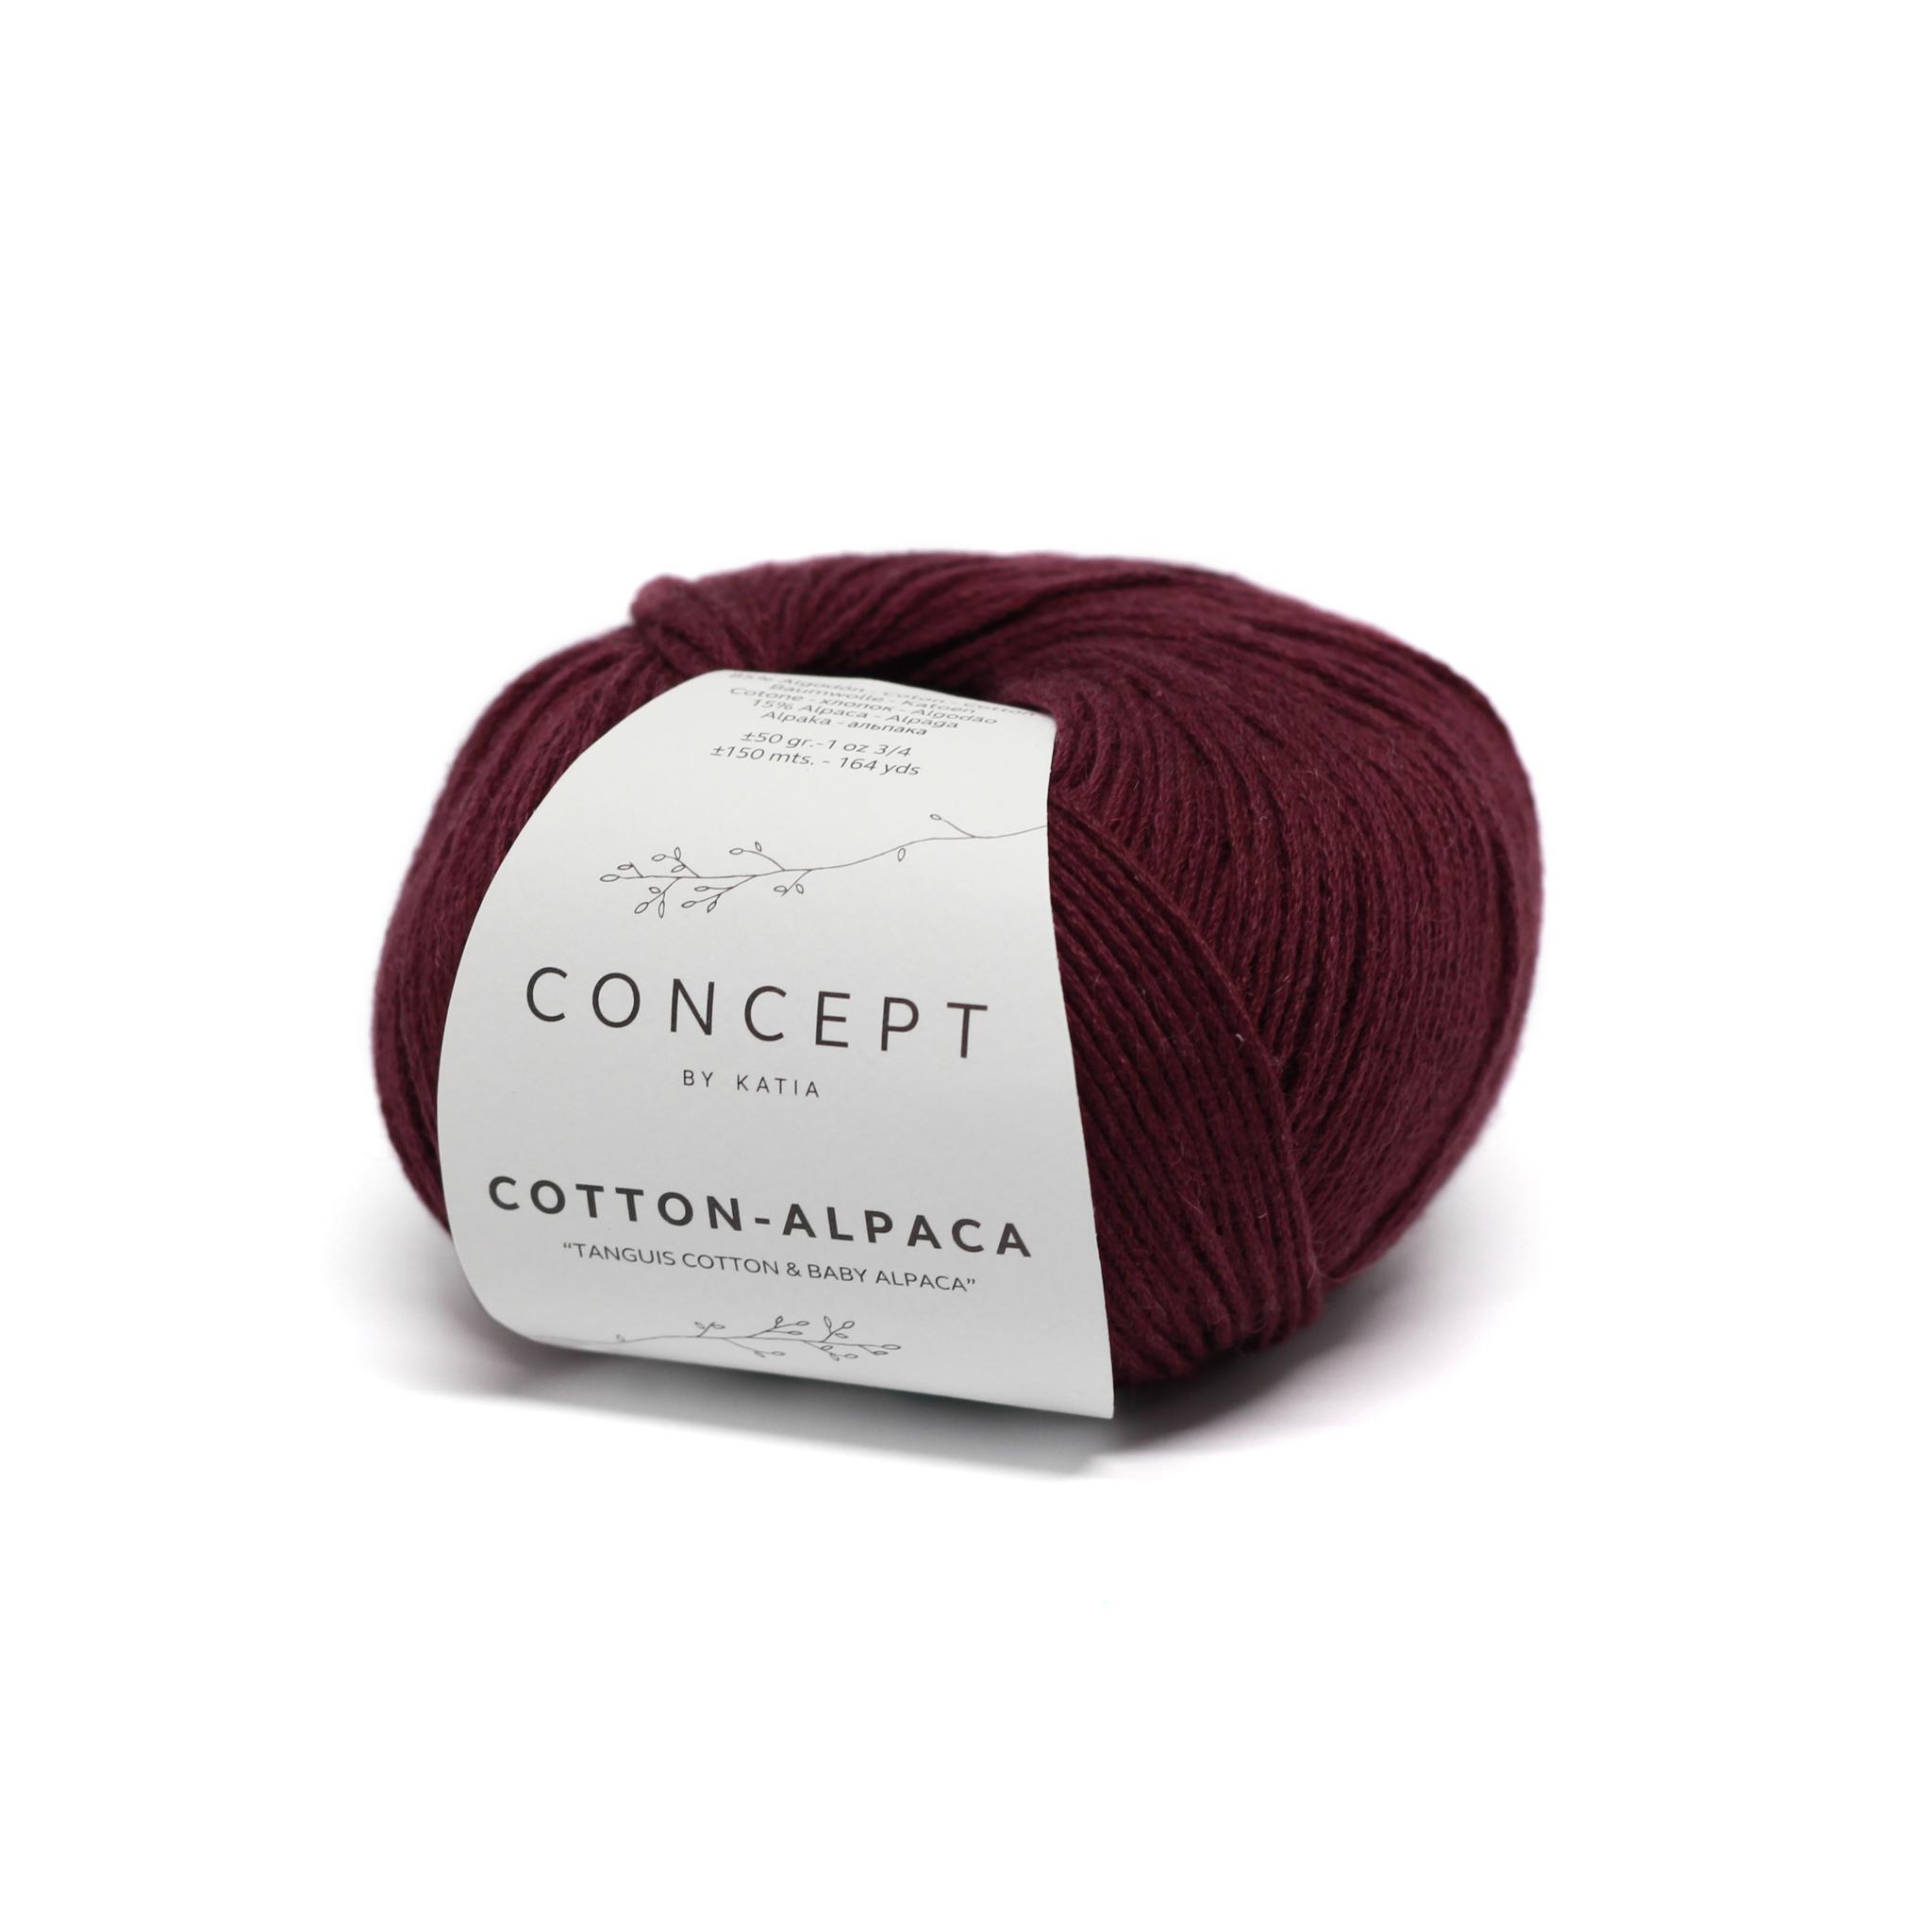 Katia Concept Cotton-Alpaca - 102